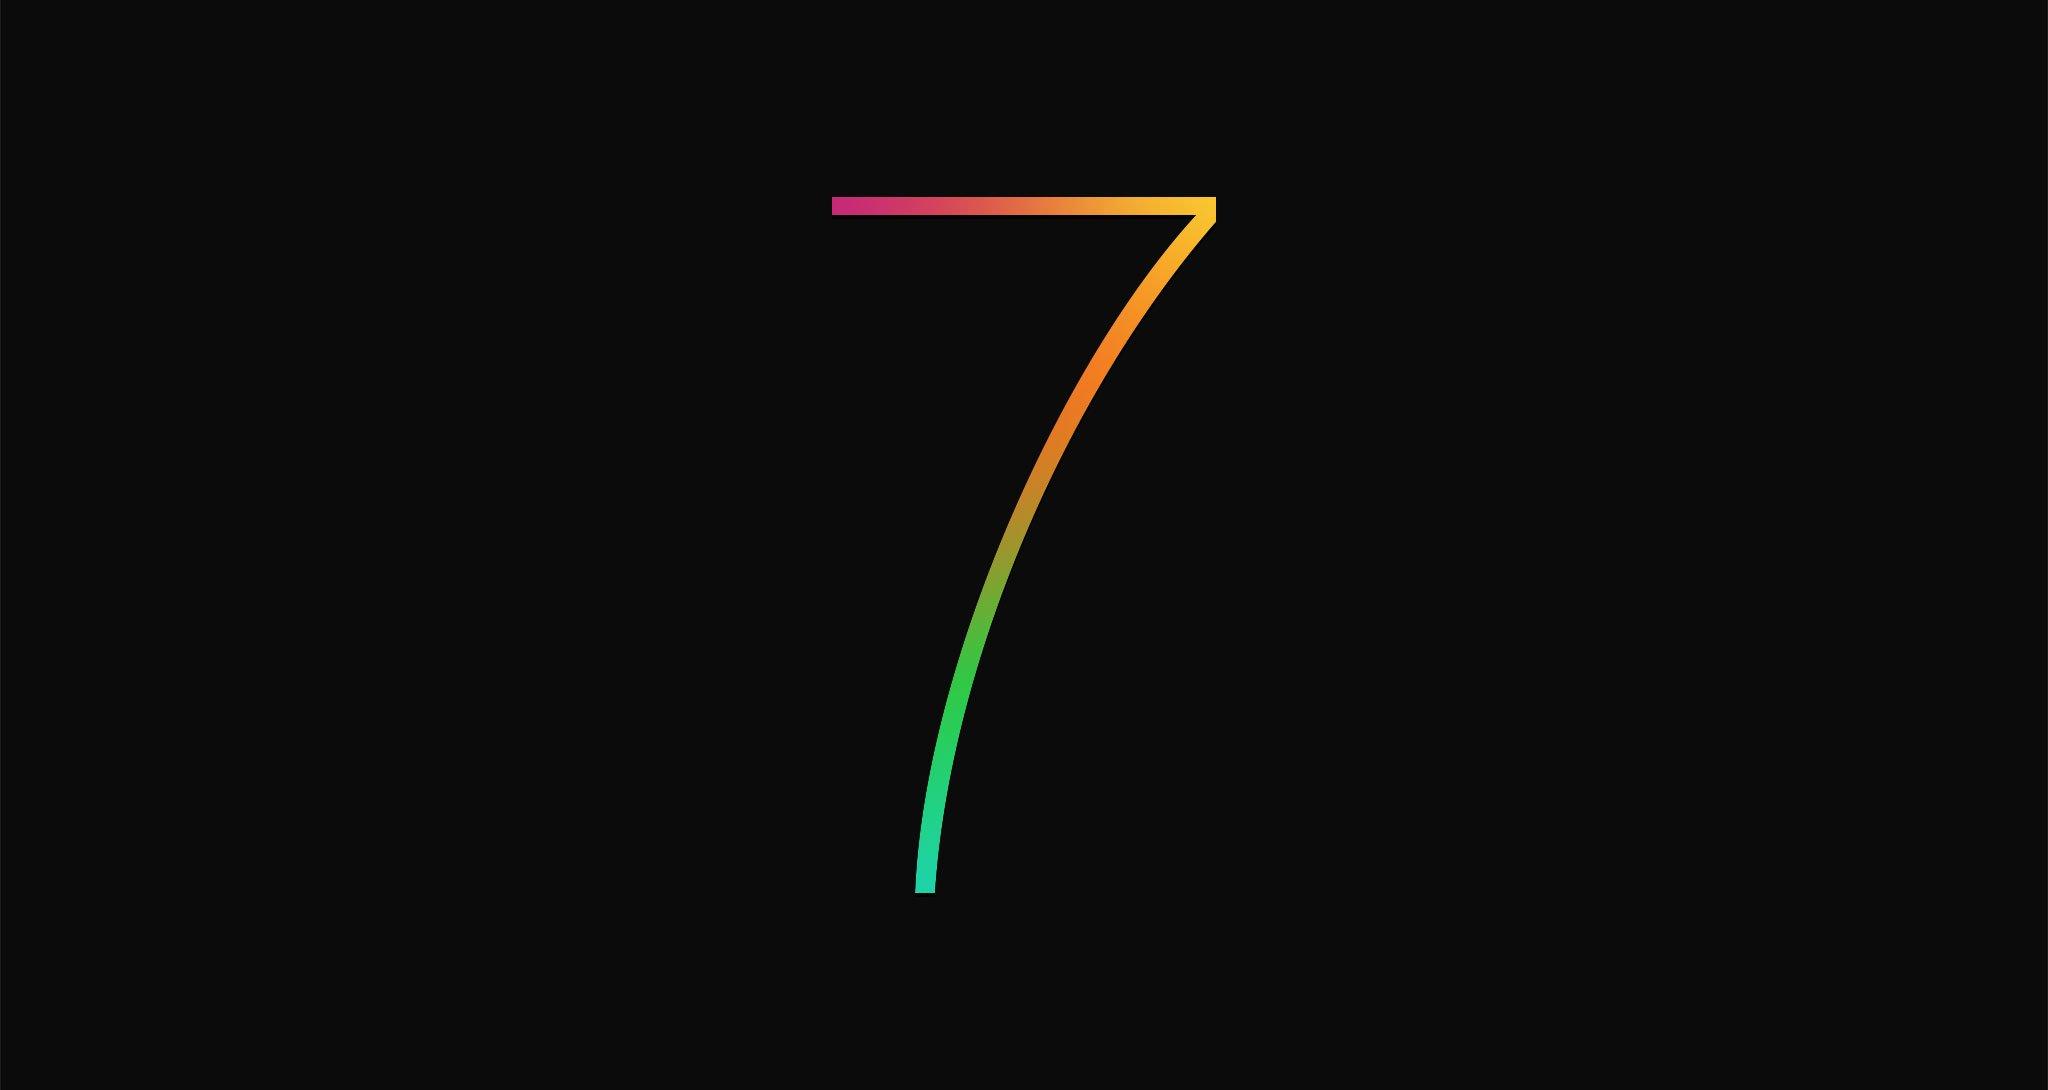 iOS 7.0.3 Update kommt am Freitag? 1